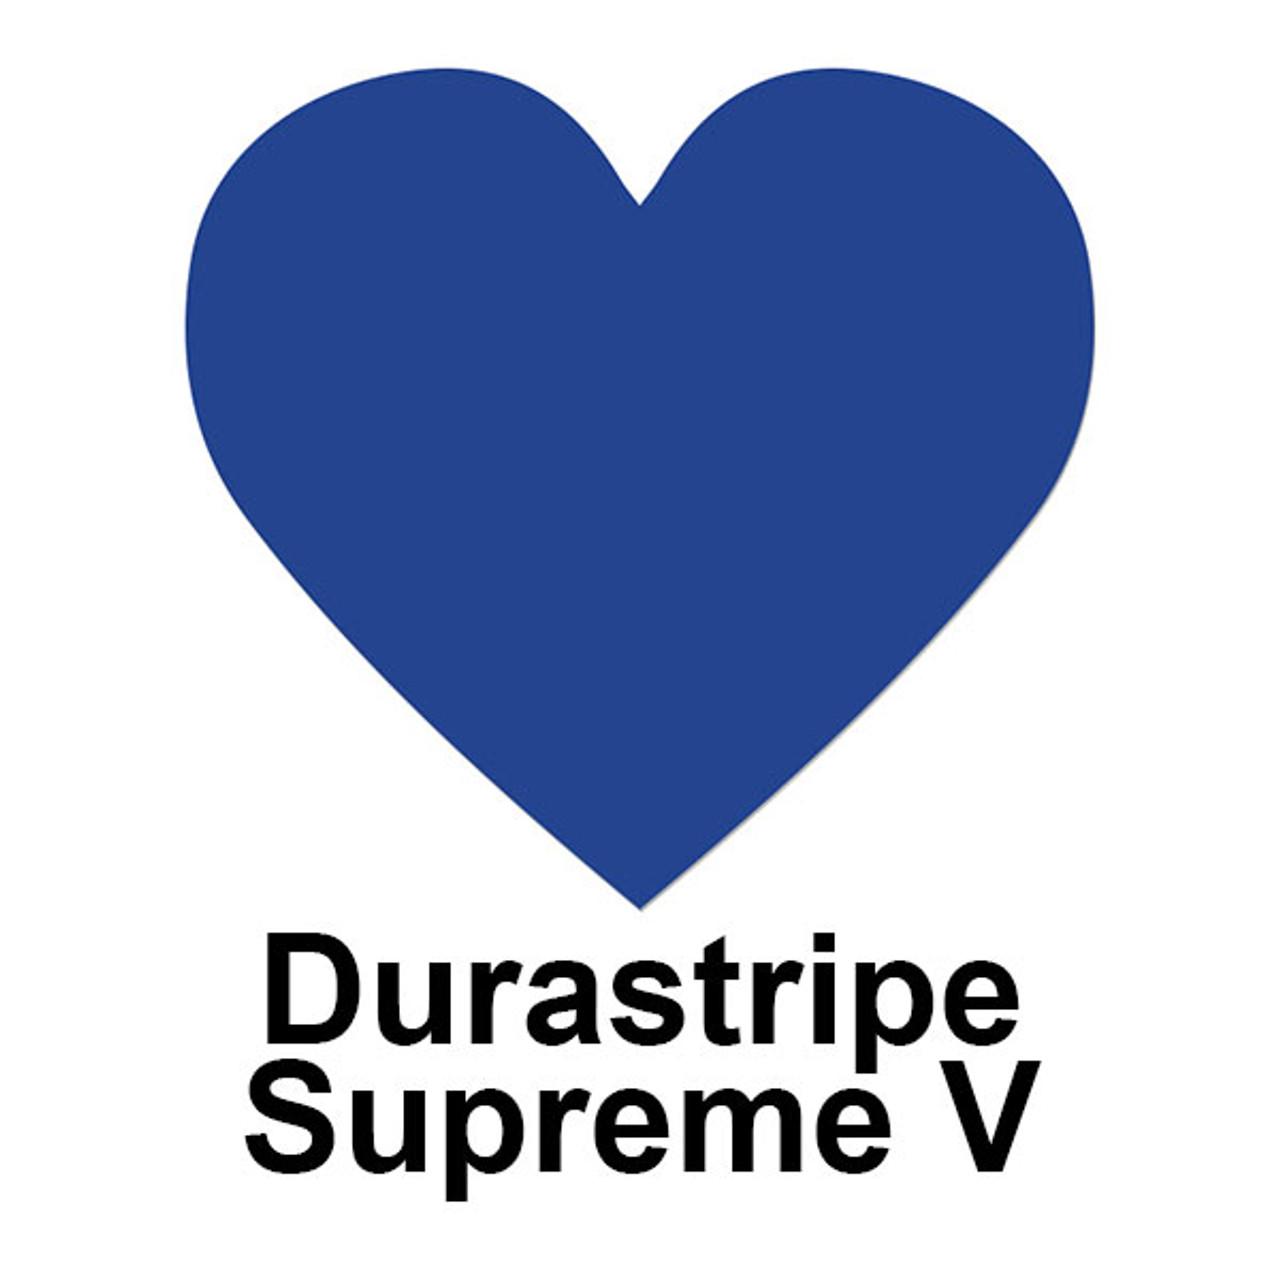 "Durastripe Supreme V Hearts 4.5"" x 4.5"" (Pack of 30)"